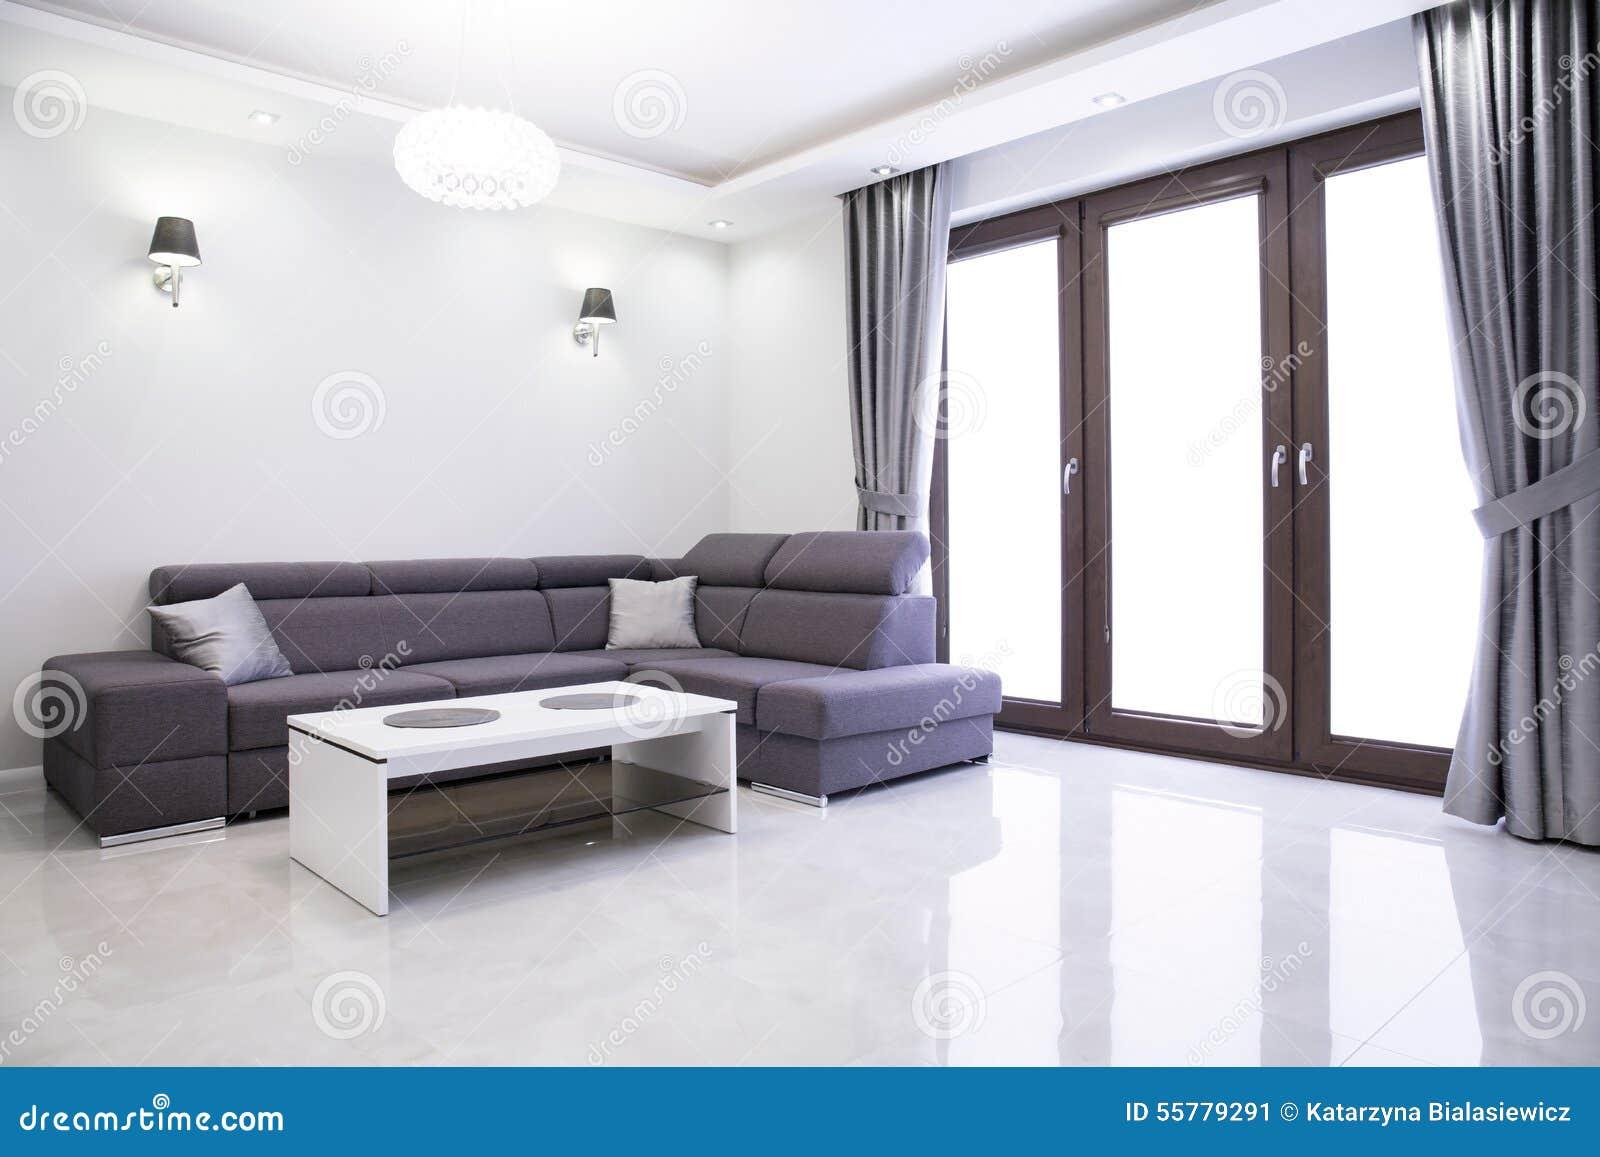 Living Room With Elegant Sofa Stock Image Image 55779291